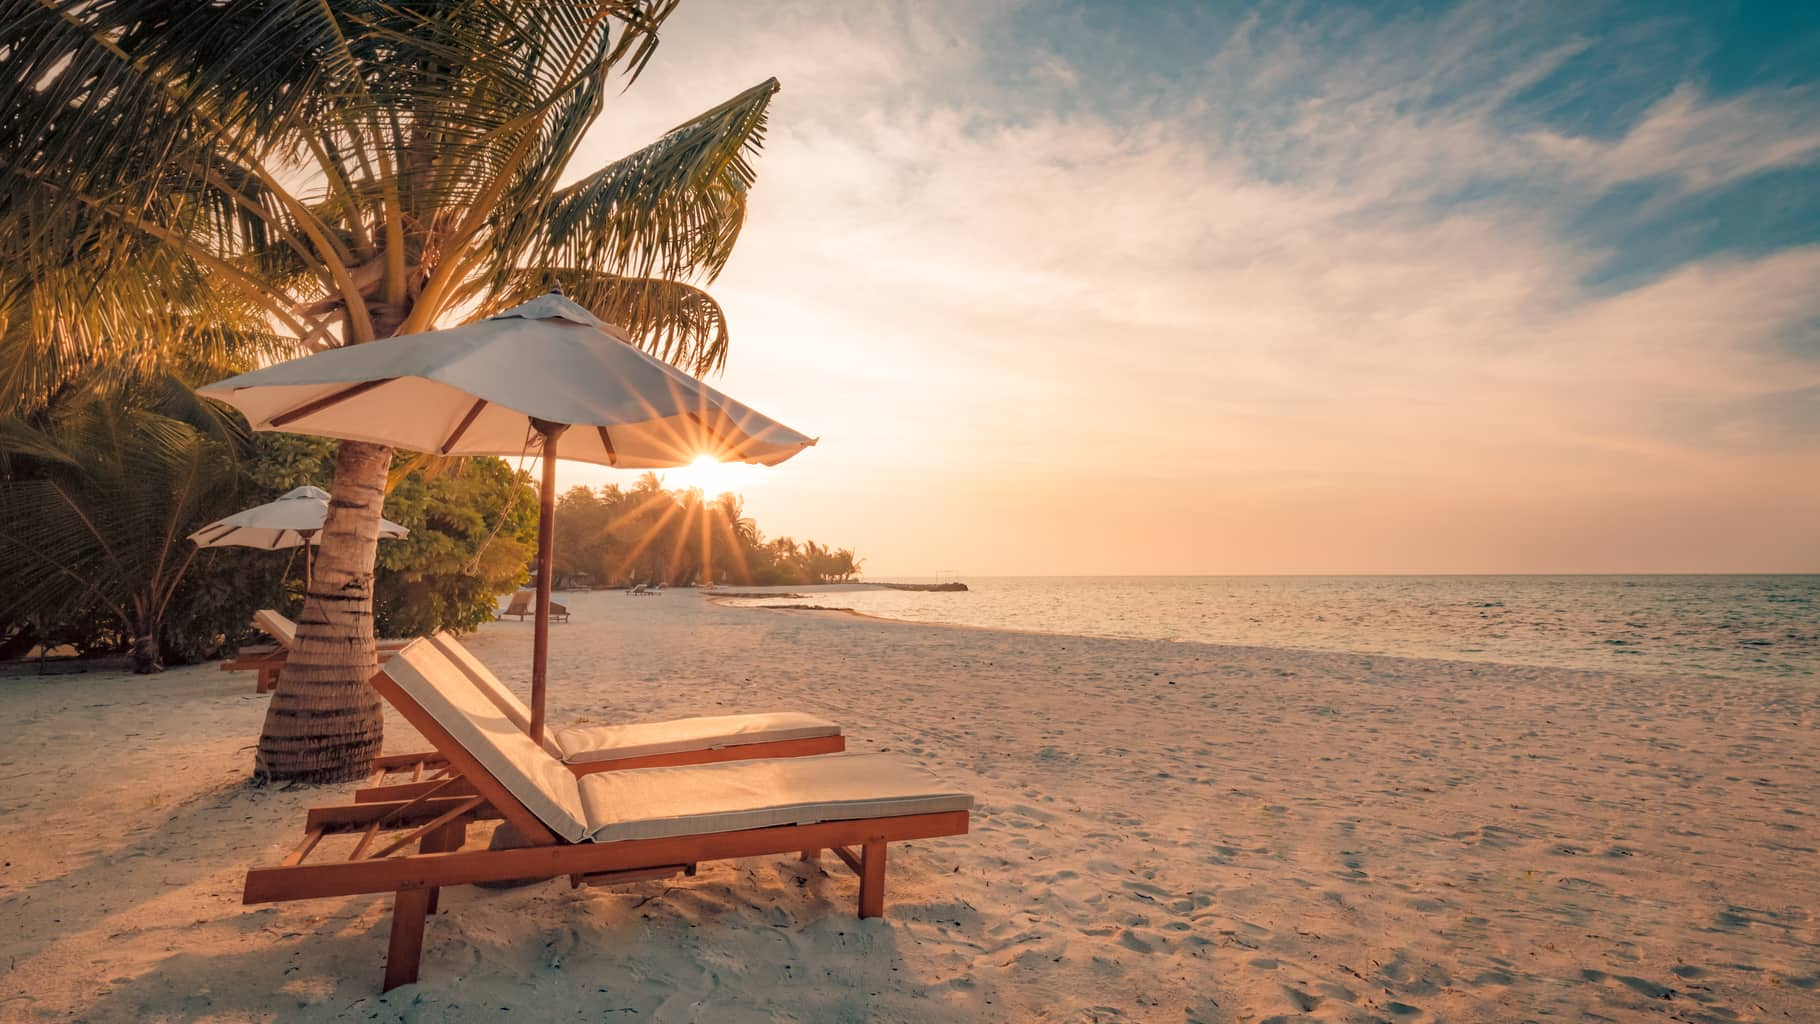 Low Cost Deals, Club Med, Mark Warner, Wendy Wu